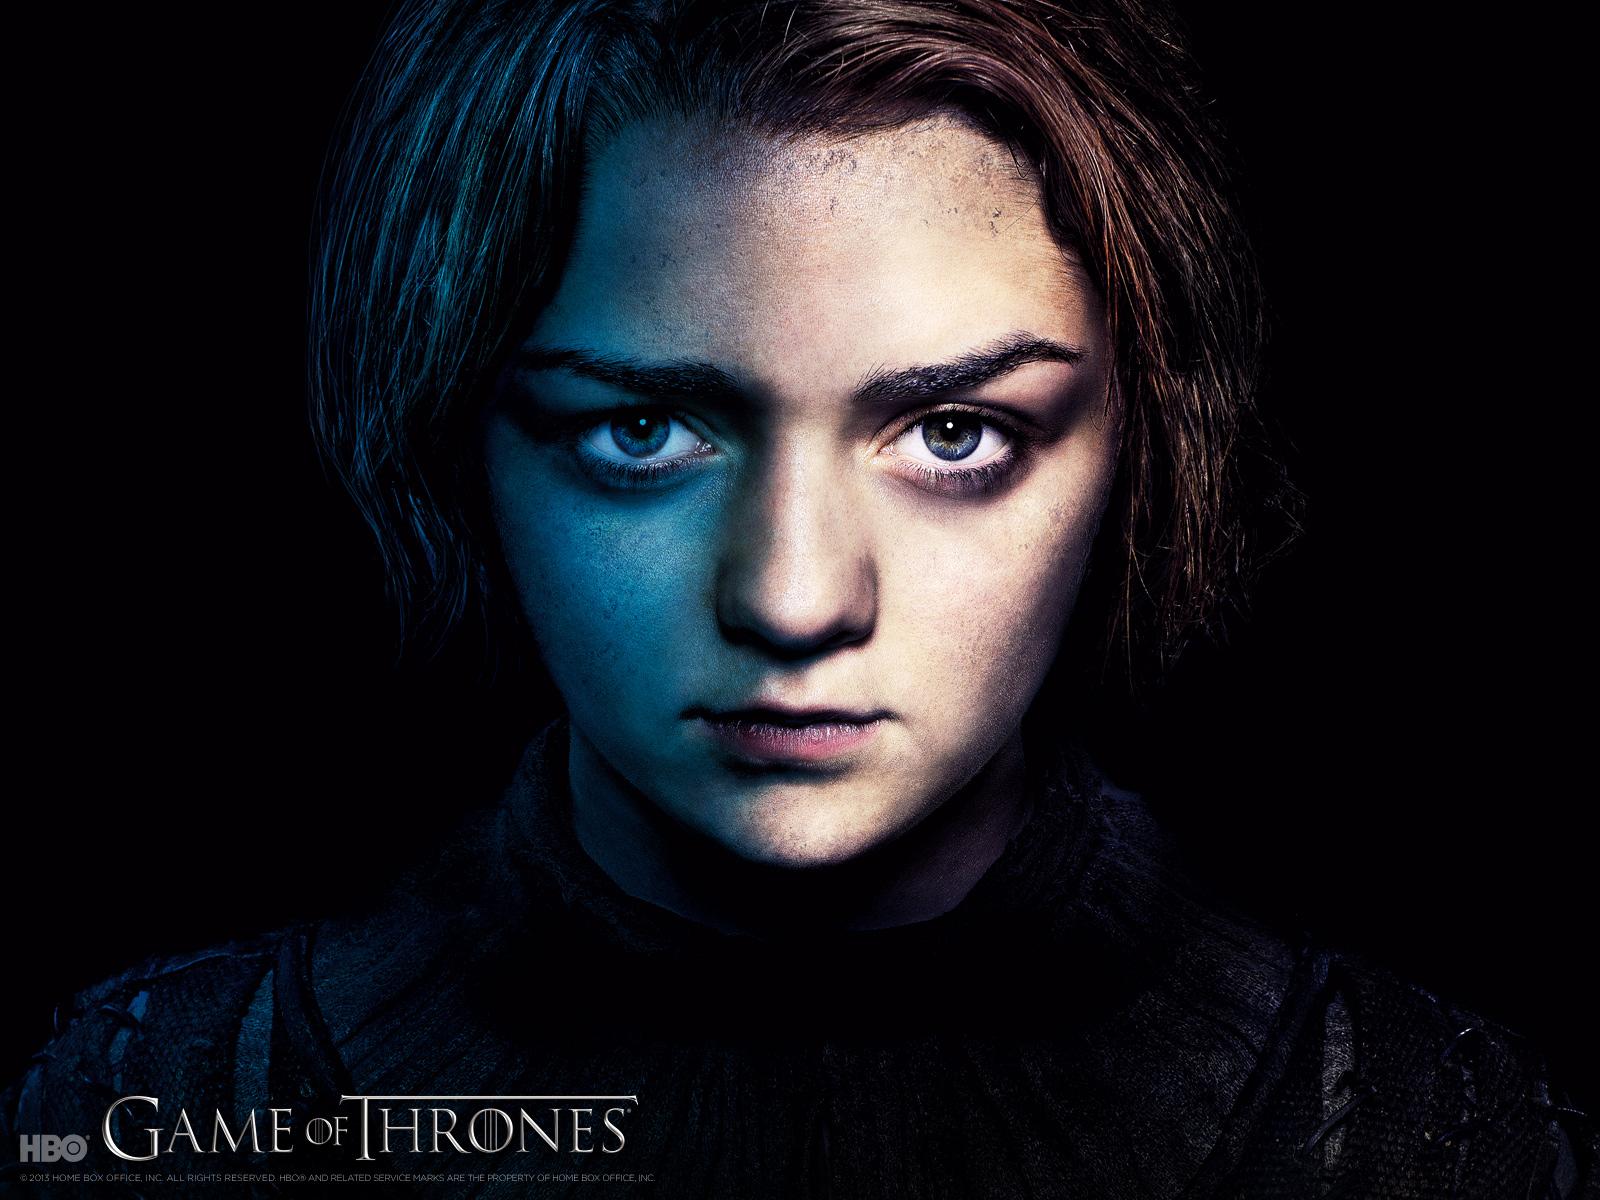 Game of Thrones Season 3 game of thrones 33779428 1600 1200jpg 1600x1200